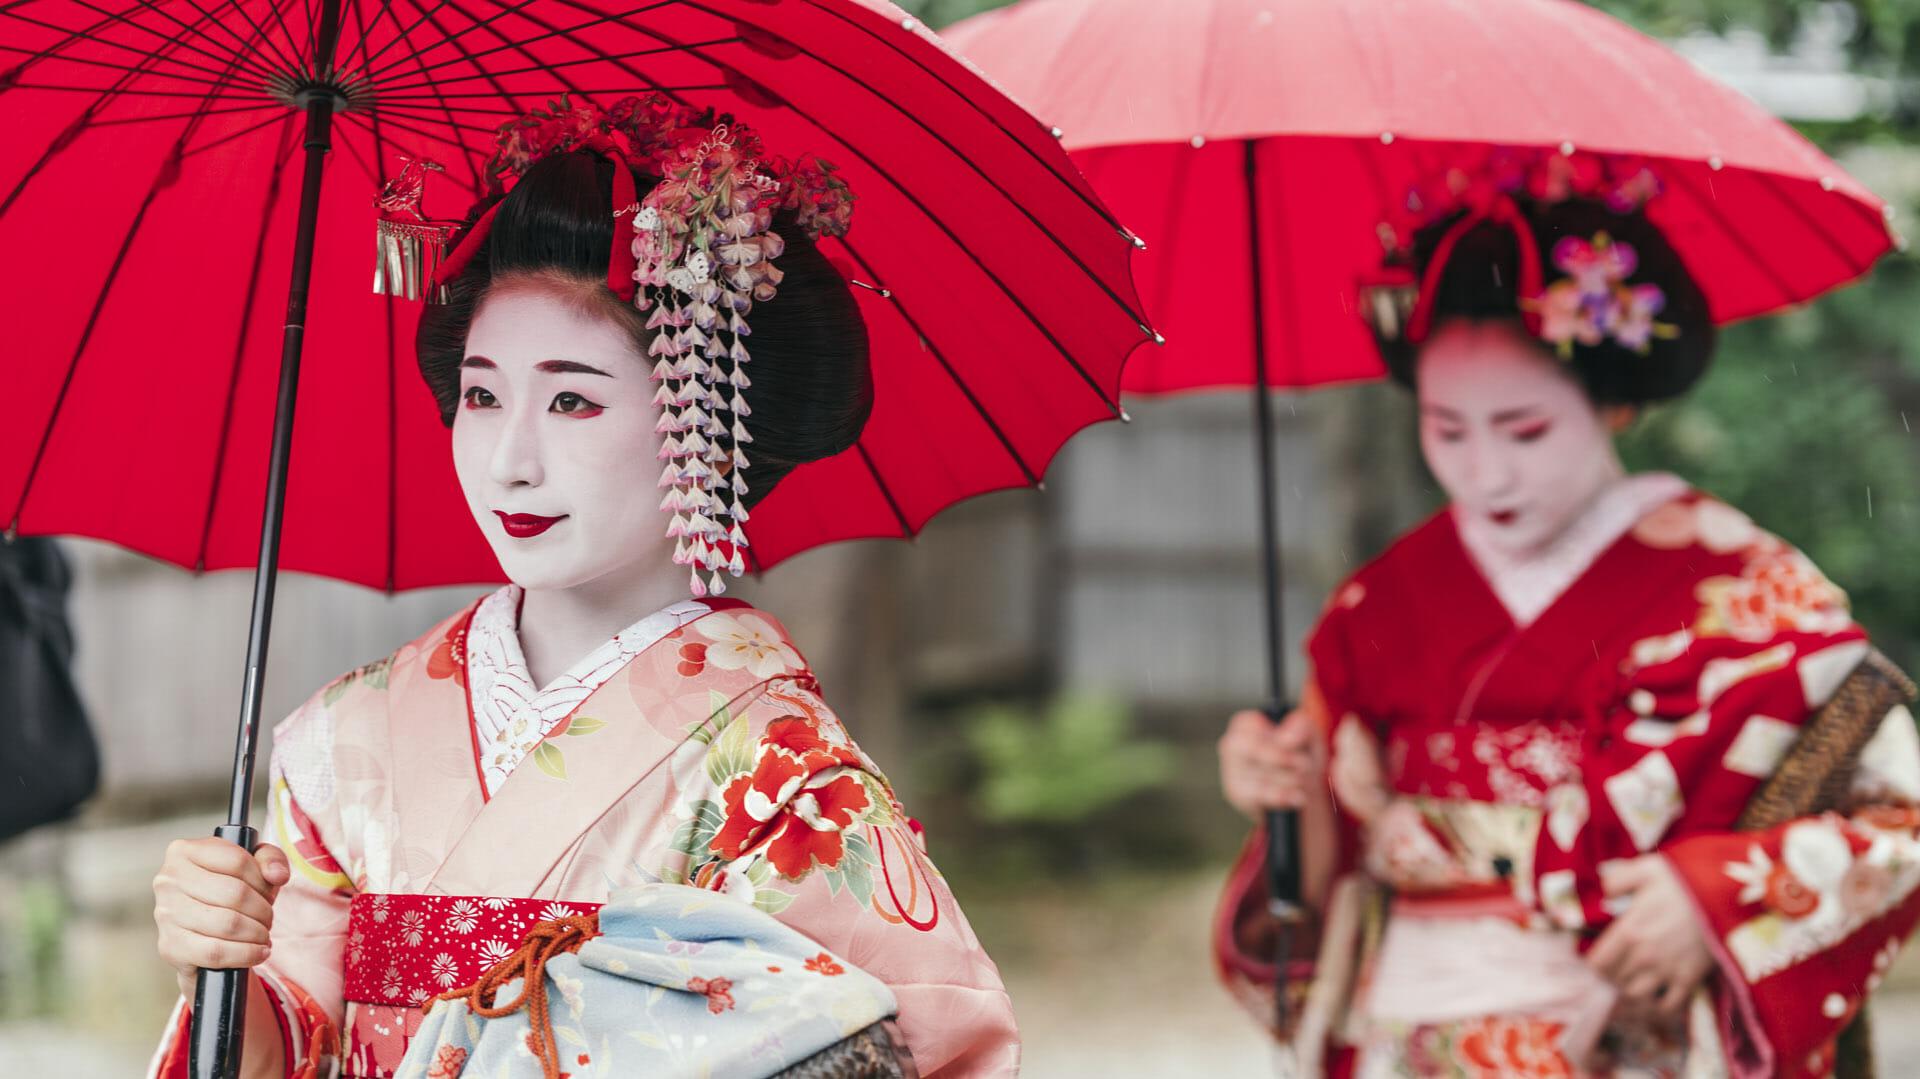 Prostitutes in Kyoto